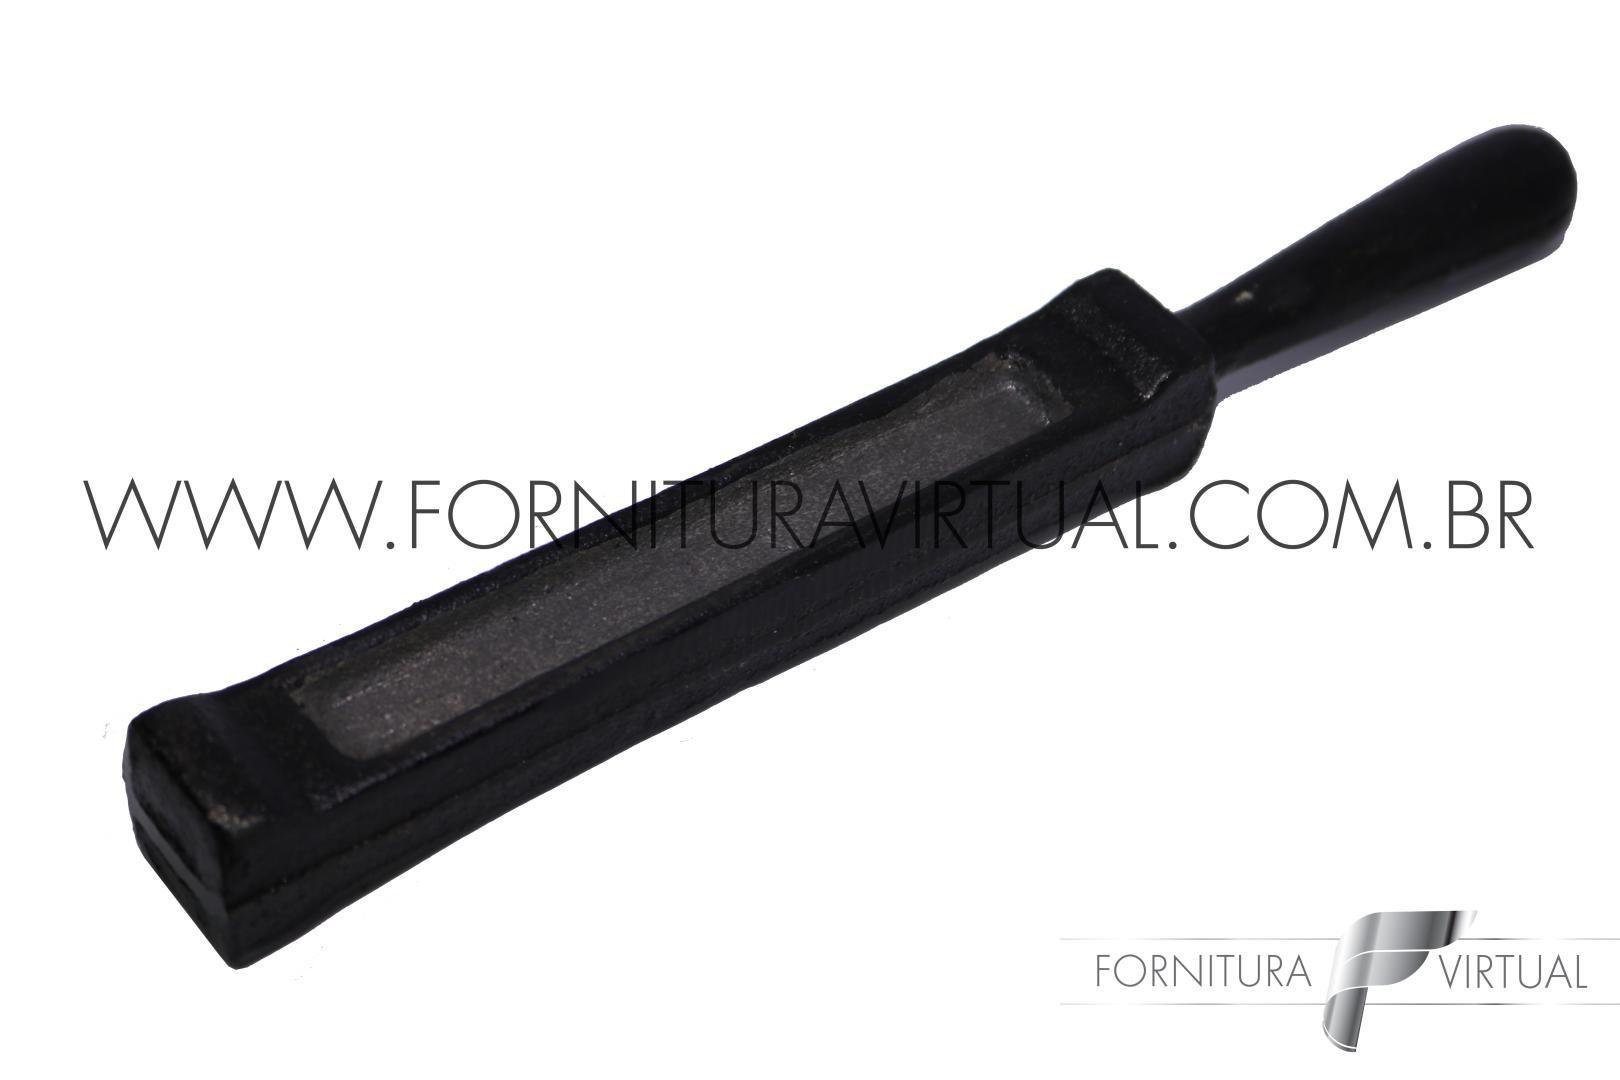 Rilheira em Ferro Fundido - 160mm